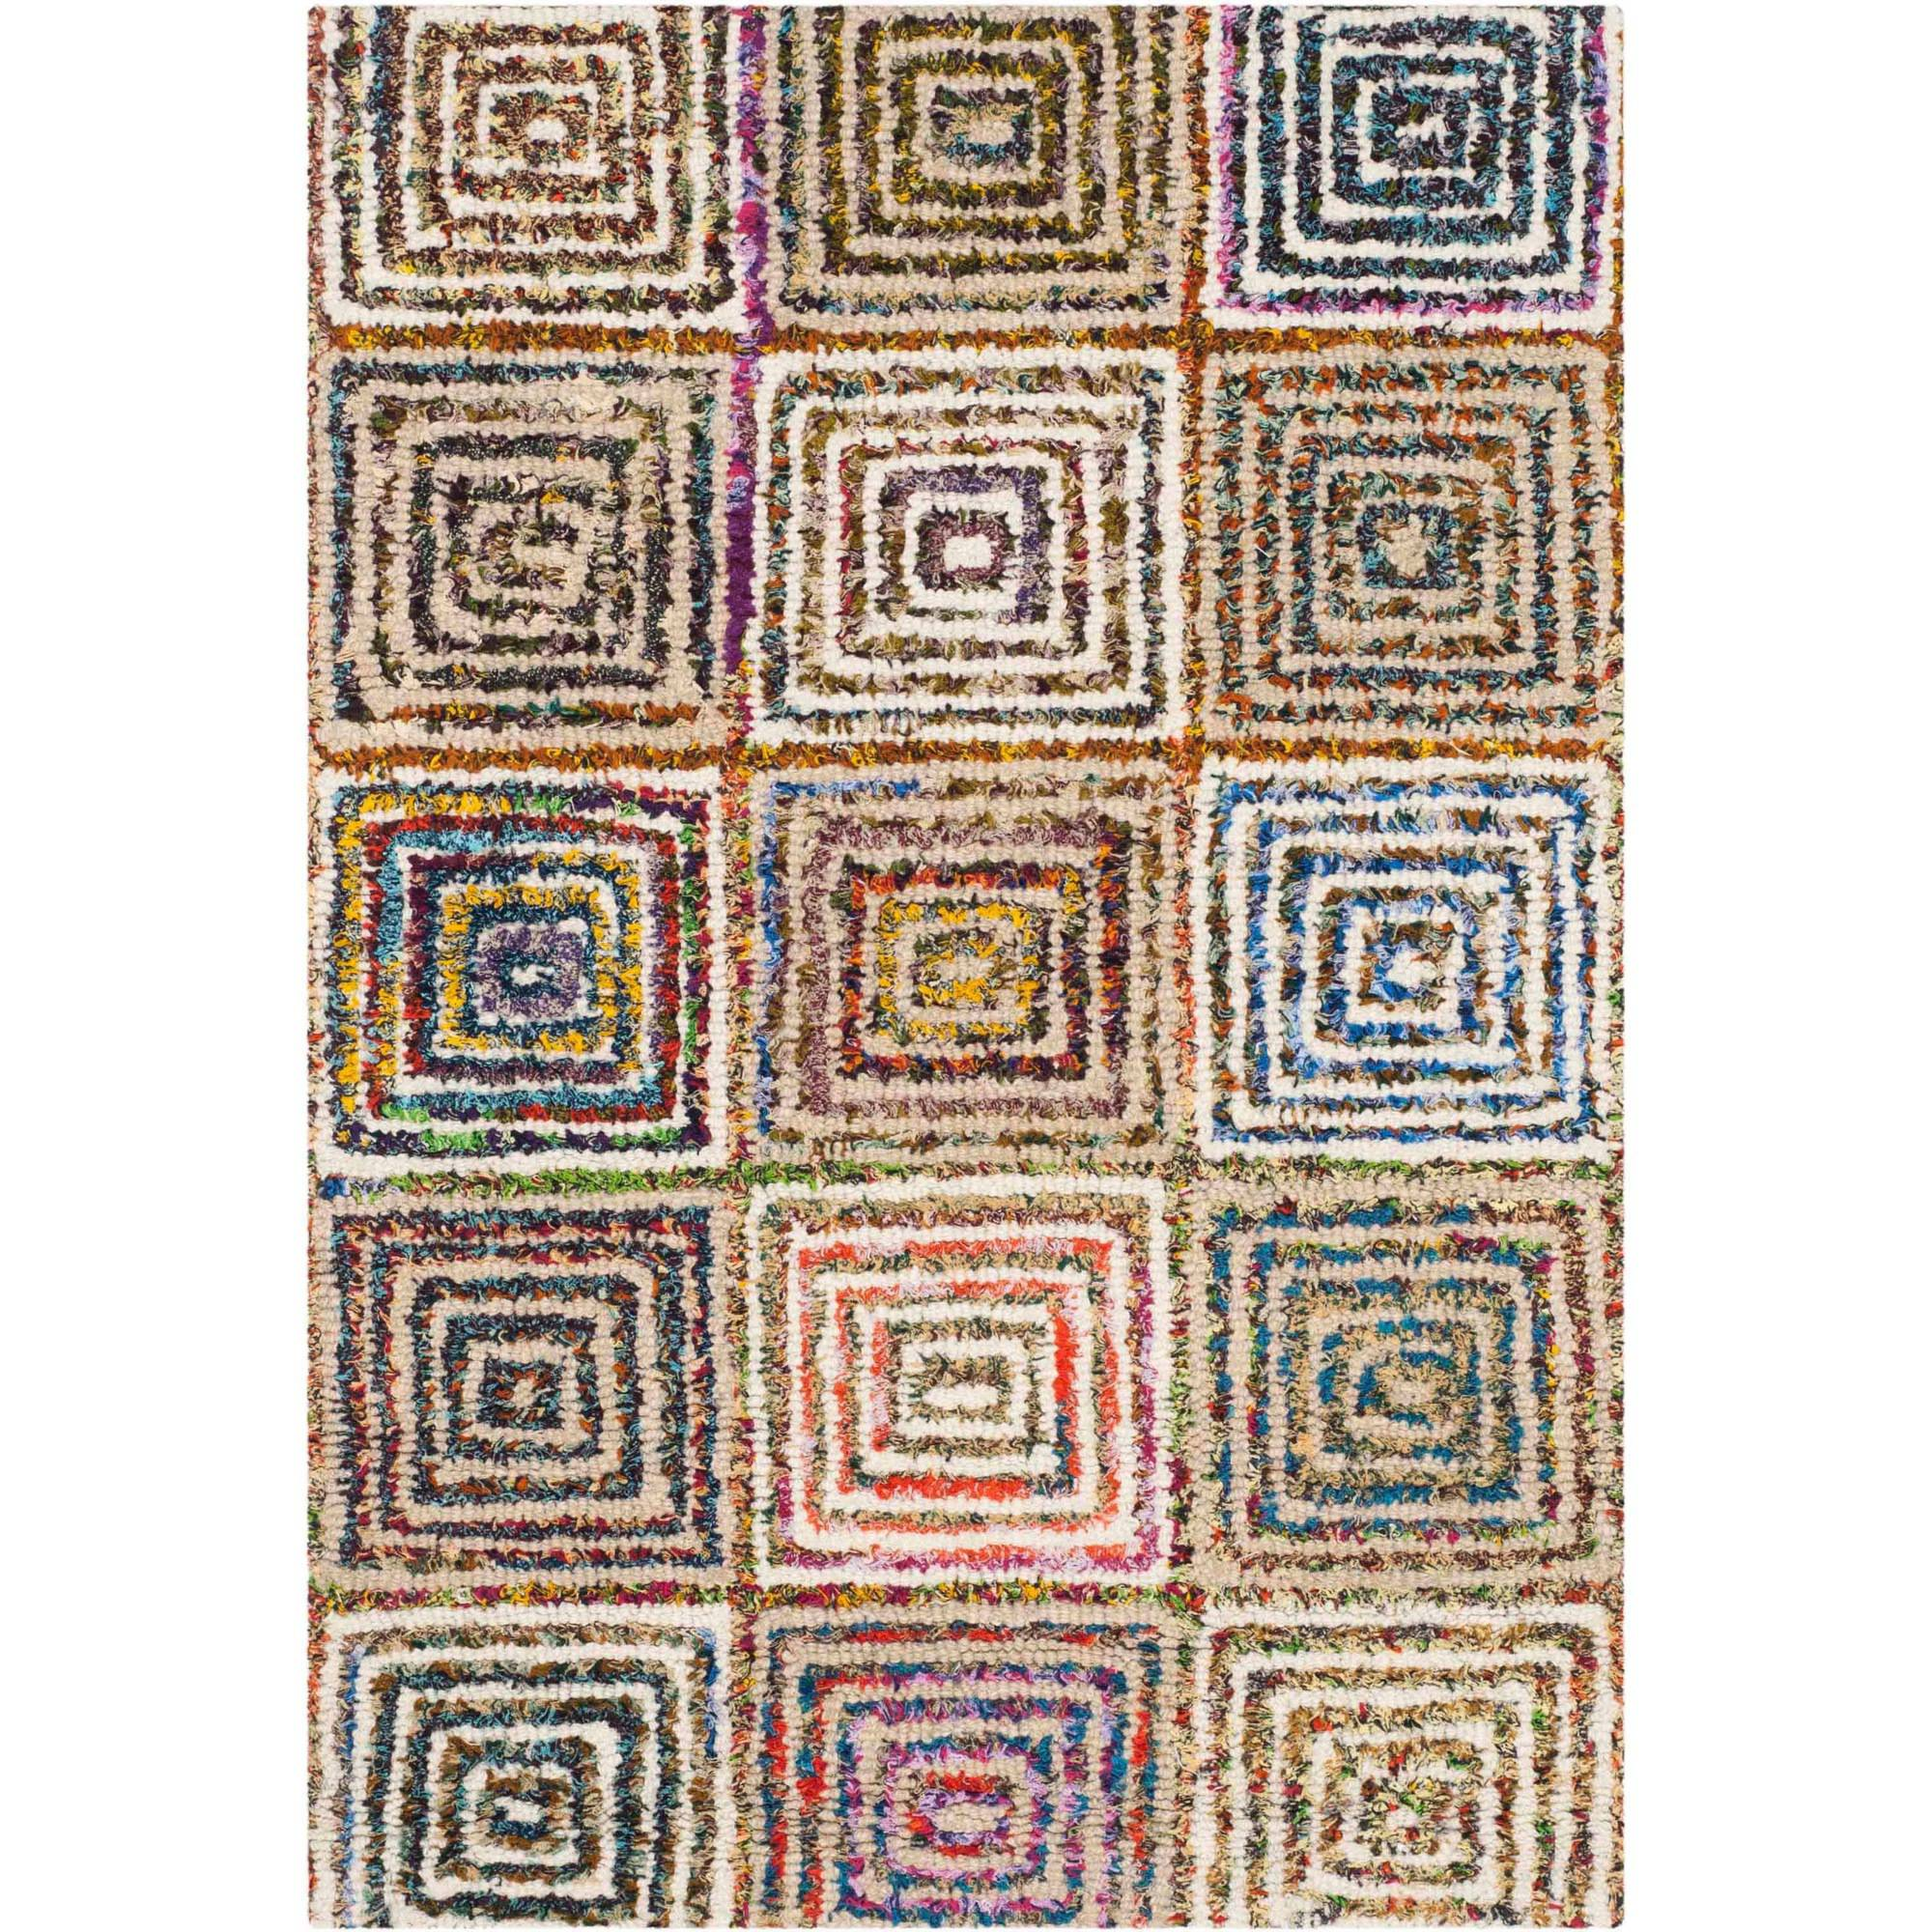 Safavieh Nantucket Euanthe Hand-Tufted Cotton Area Rug, Cream/Multi